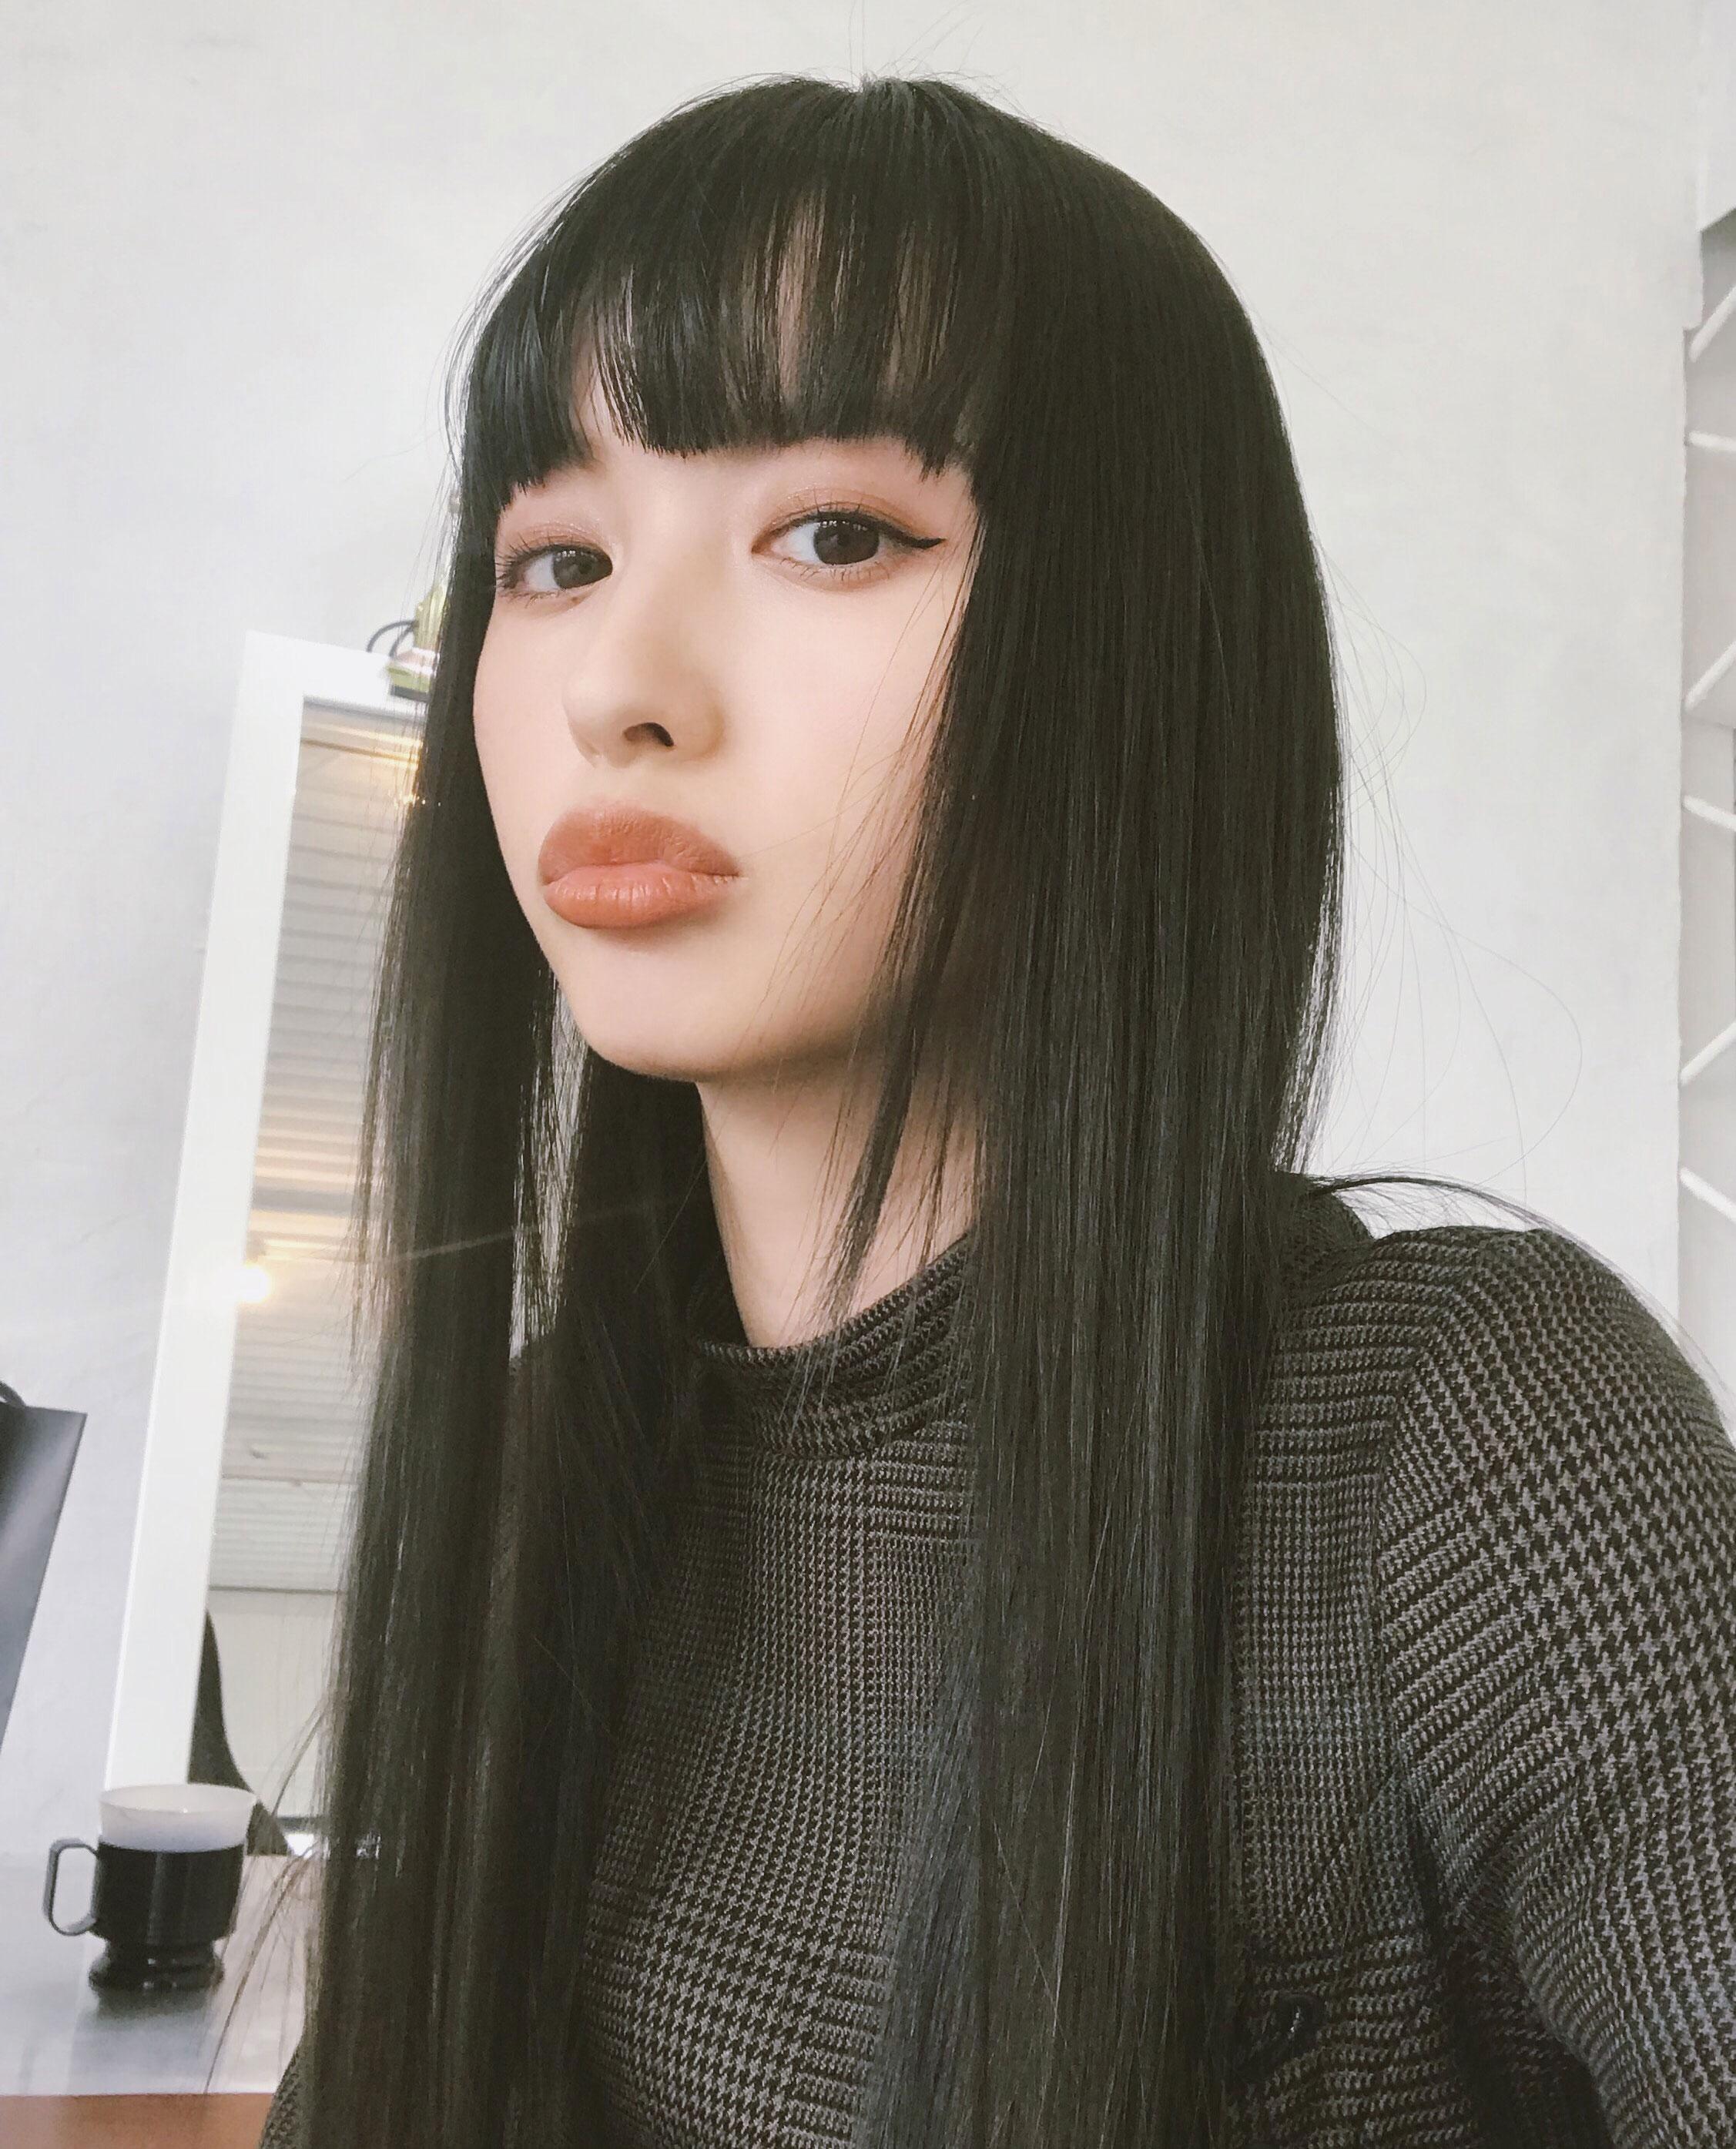 Emi Suzuki - Top Most Beautiful Chinese Models